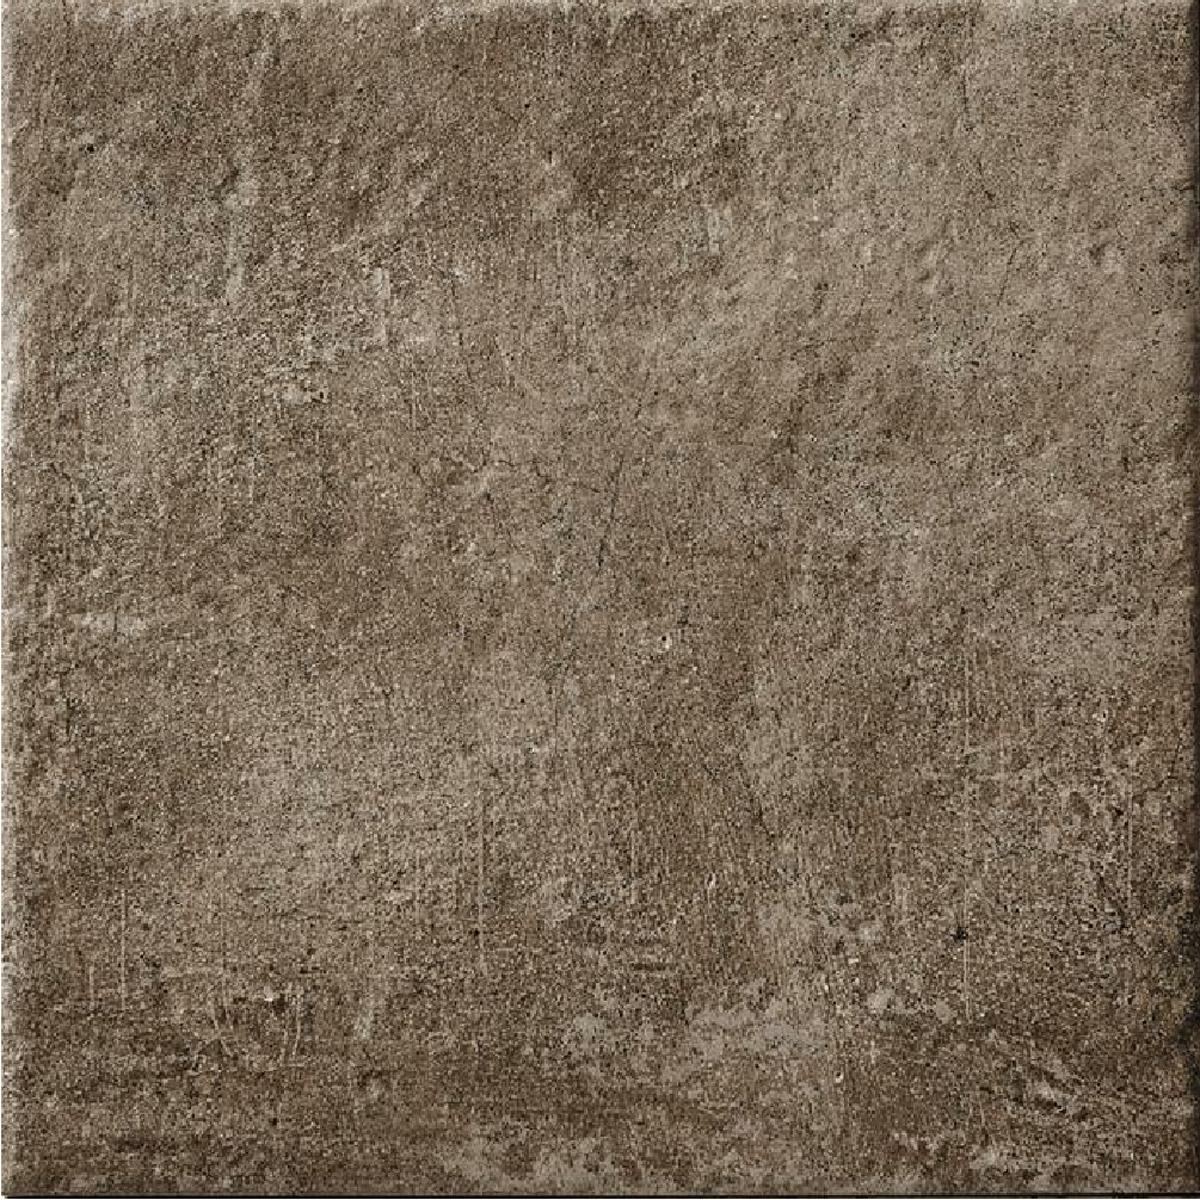 Durango Taupe 33.3x33.3 (caja de 1 m2)